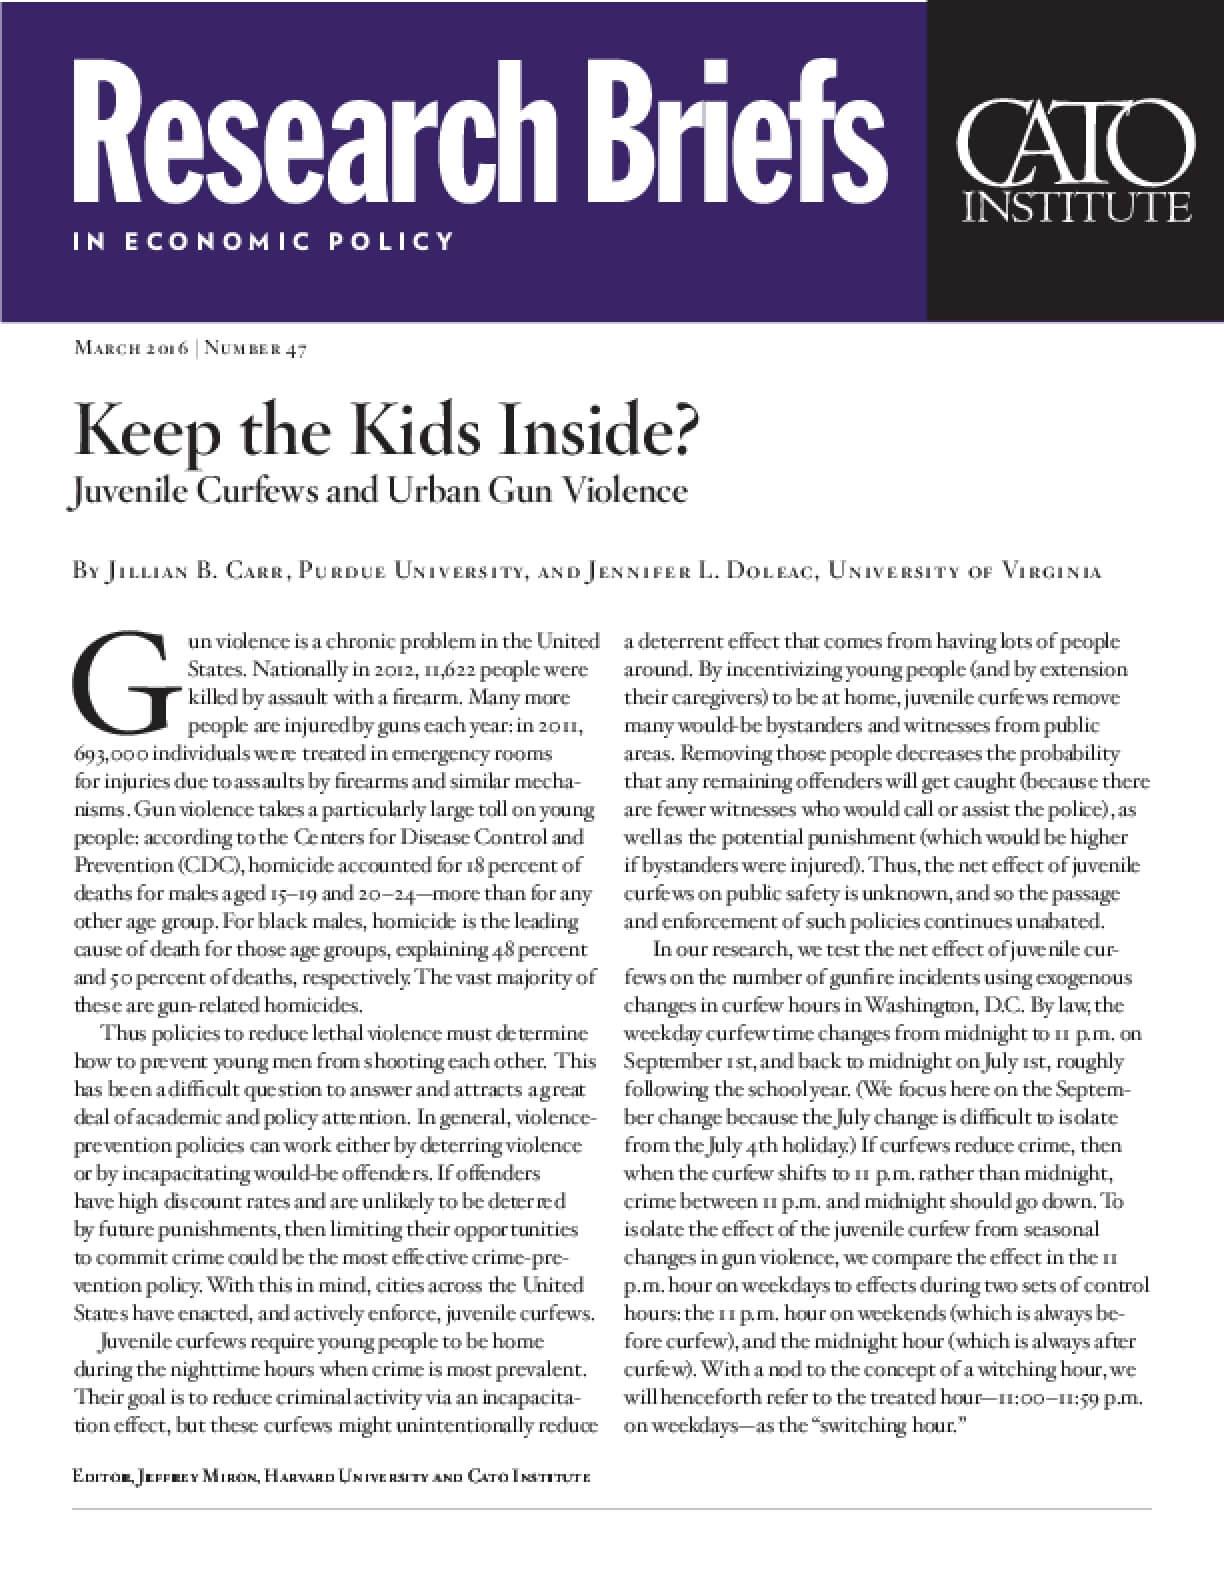 Keep the Kids Inside? Juvenile Curfews and Urban Gun Violence